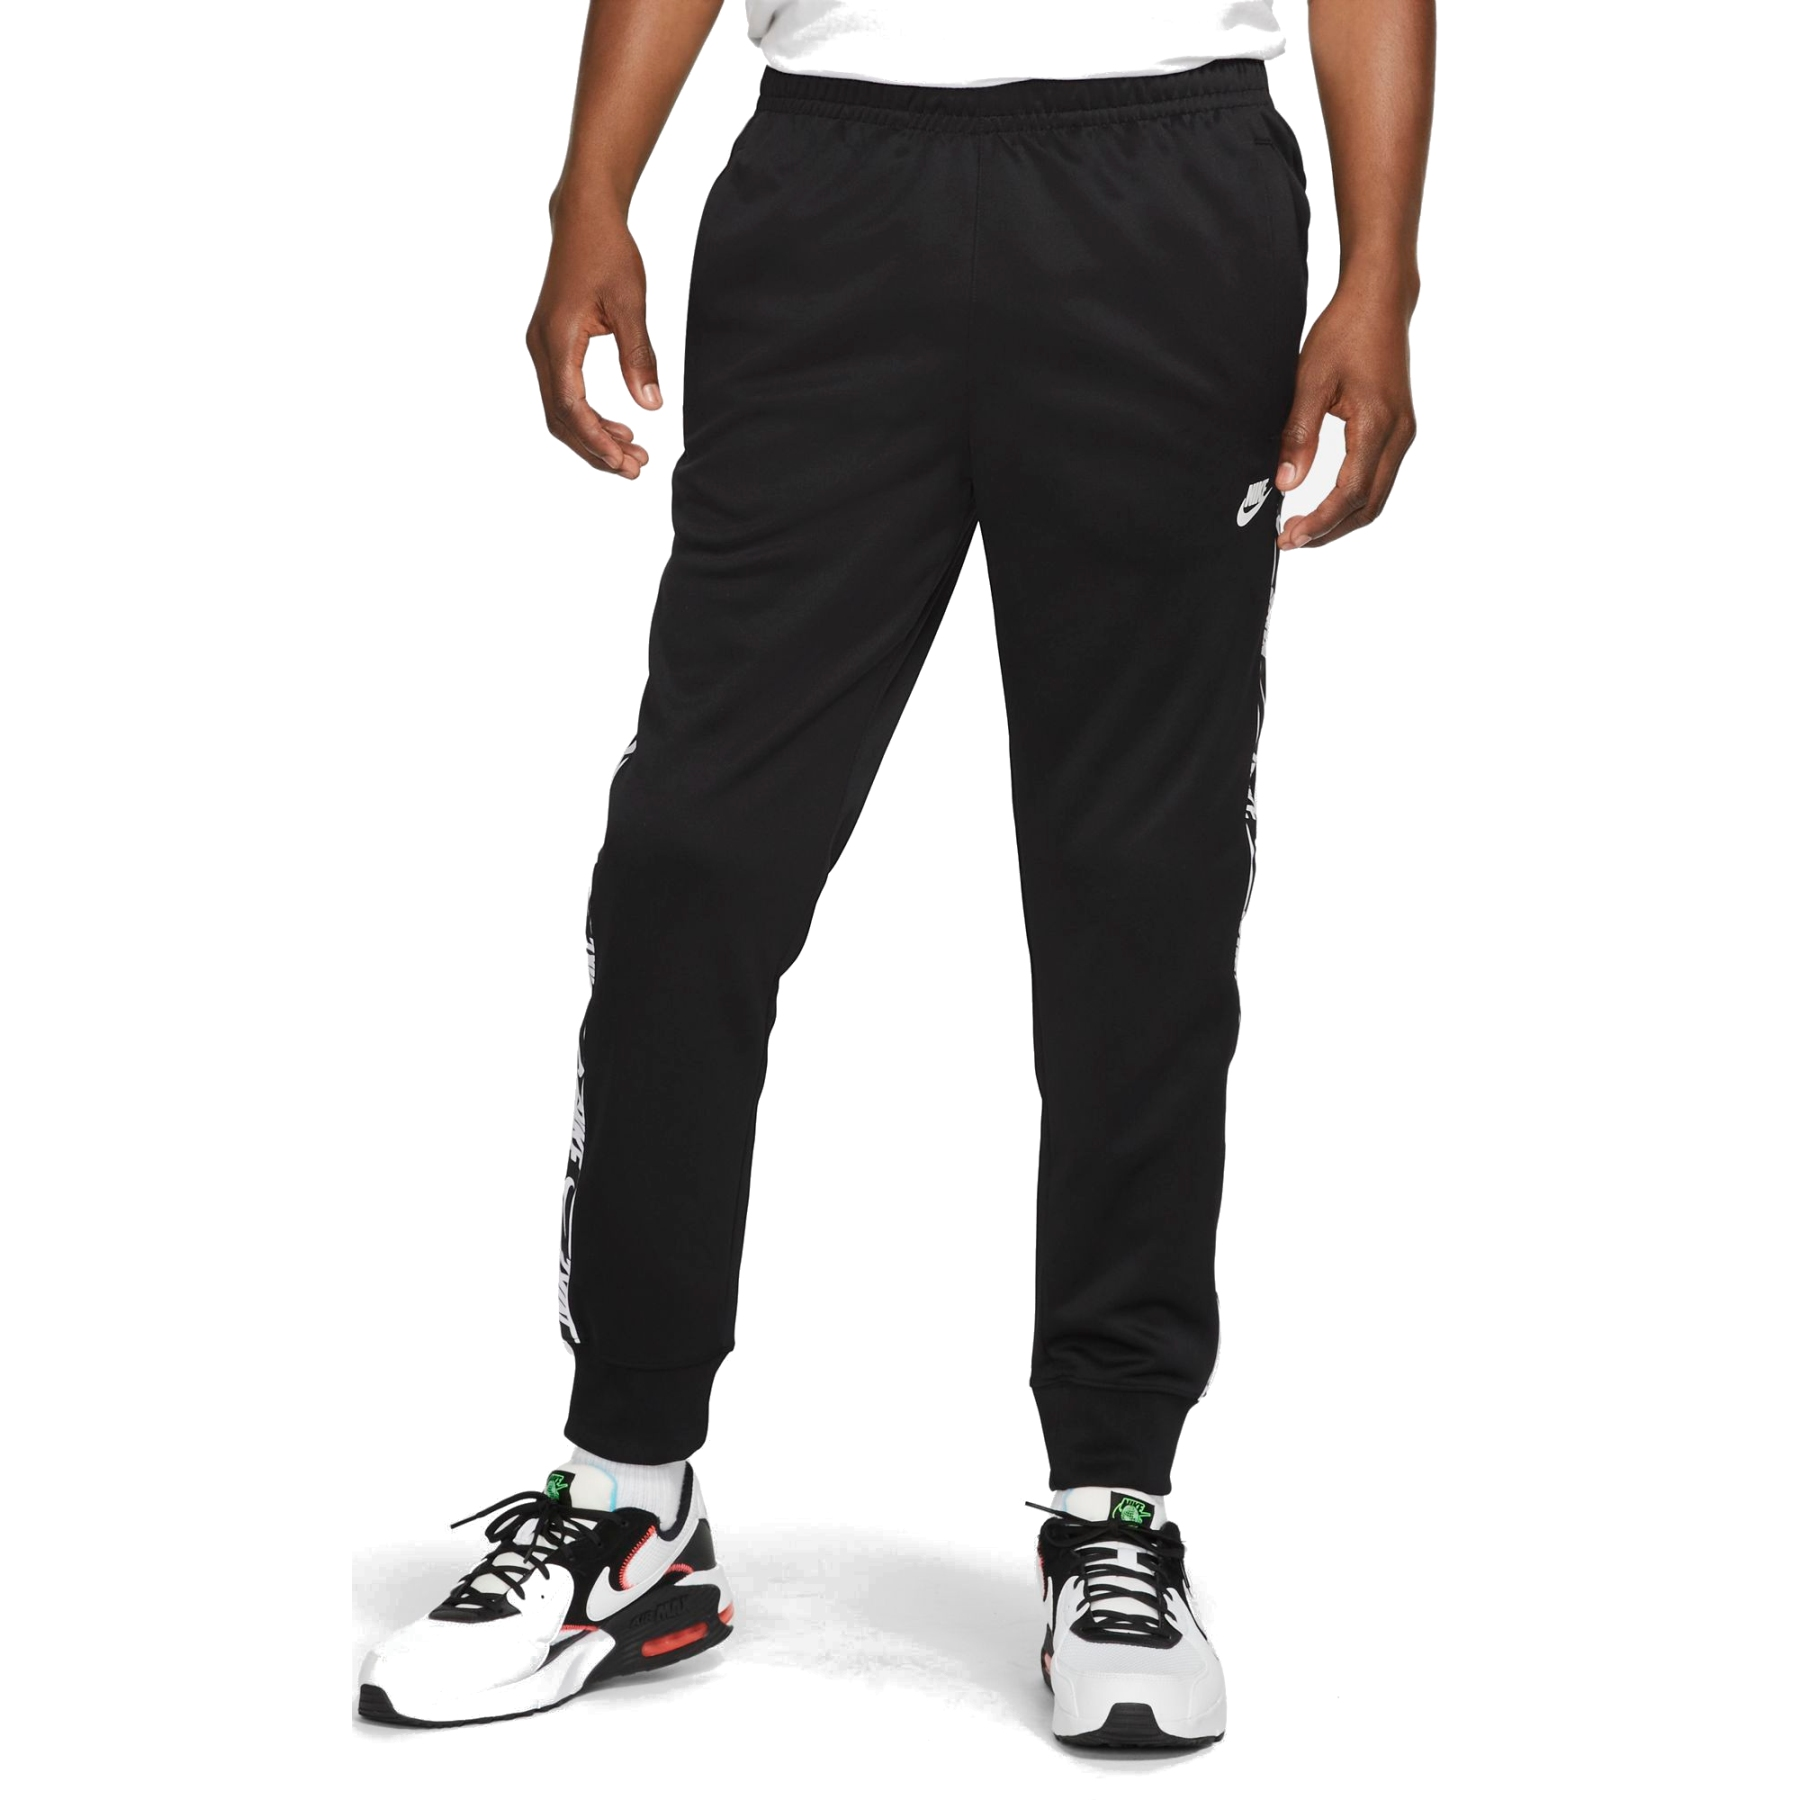 Produktbild von Nike Sportswear Herren-Jogginghose - black/black/white DM4673-010